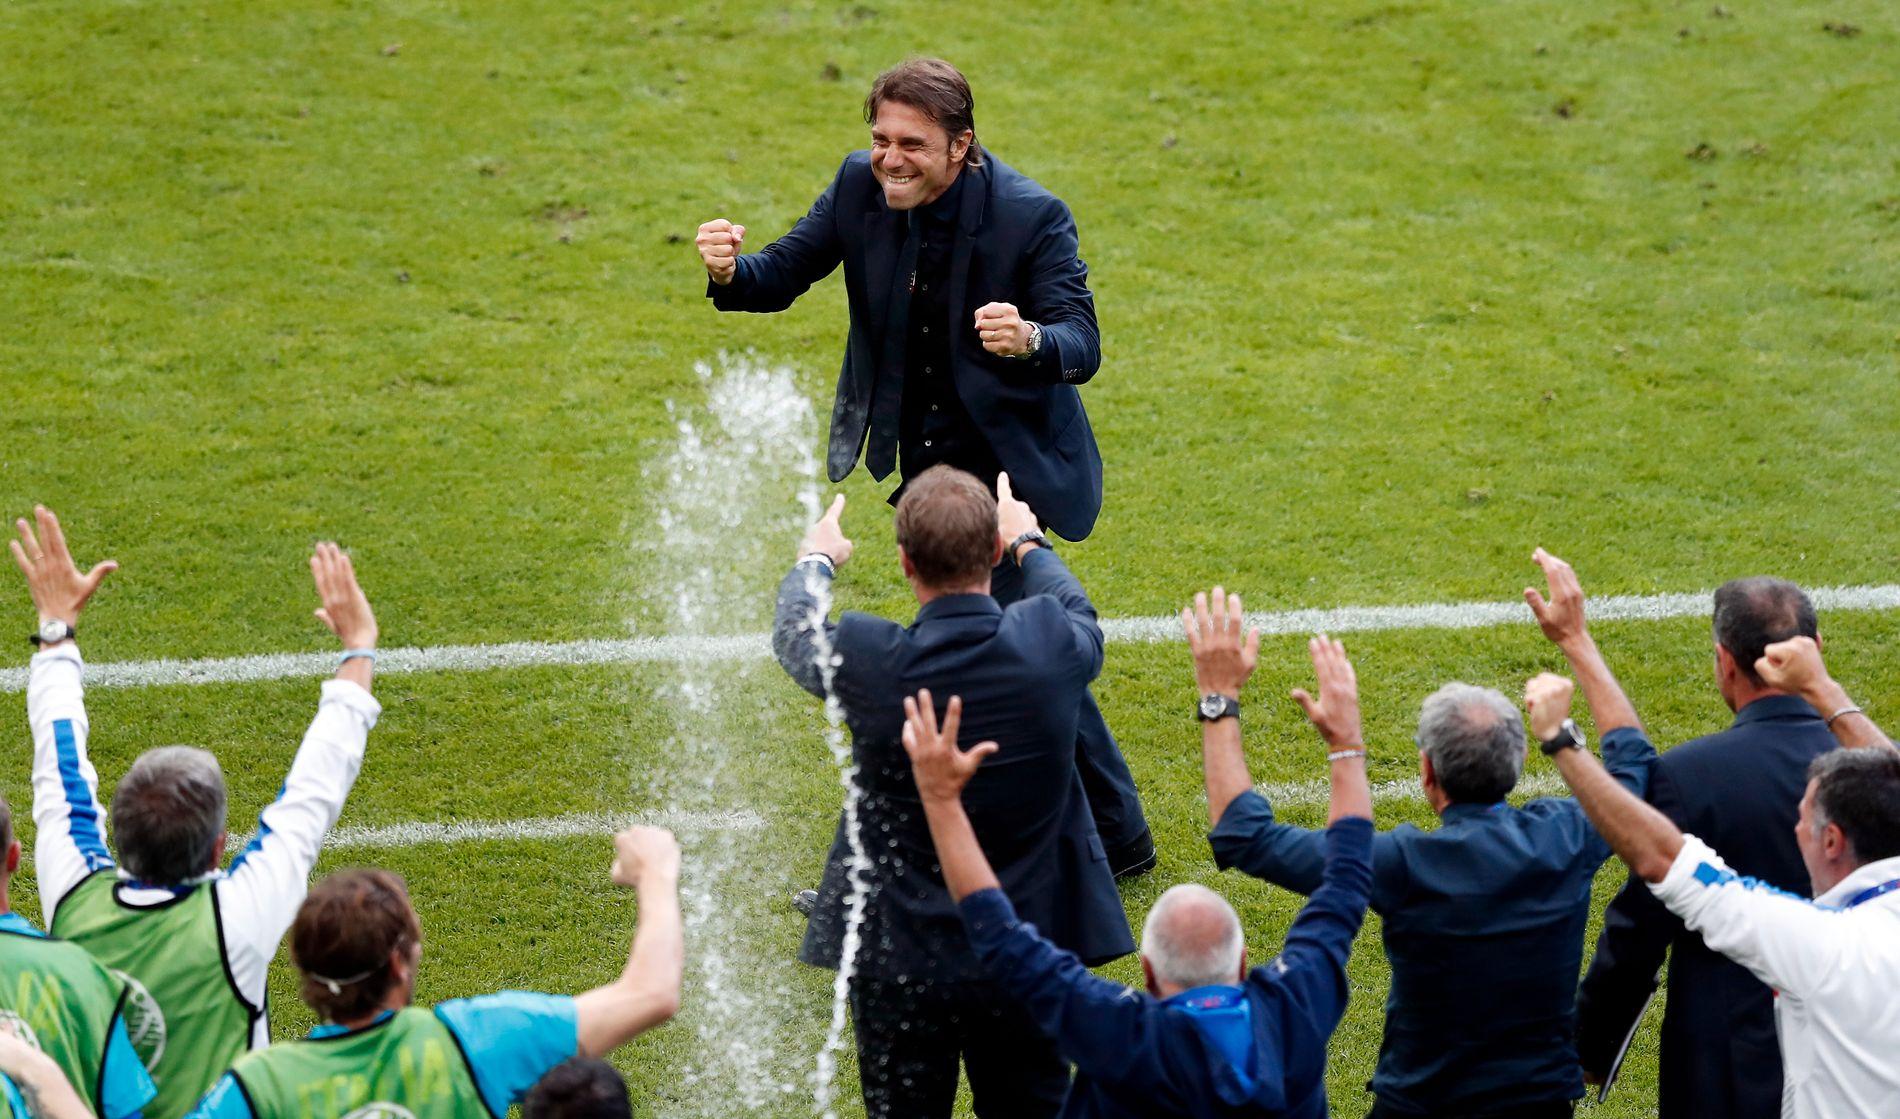 SJEFEN: Antonio Conte feirer etter at Graziano Pellè scoret Italias 2-0-mål i åttedelsfinalen mot Spania.